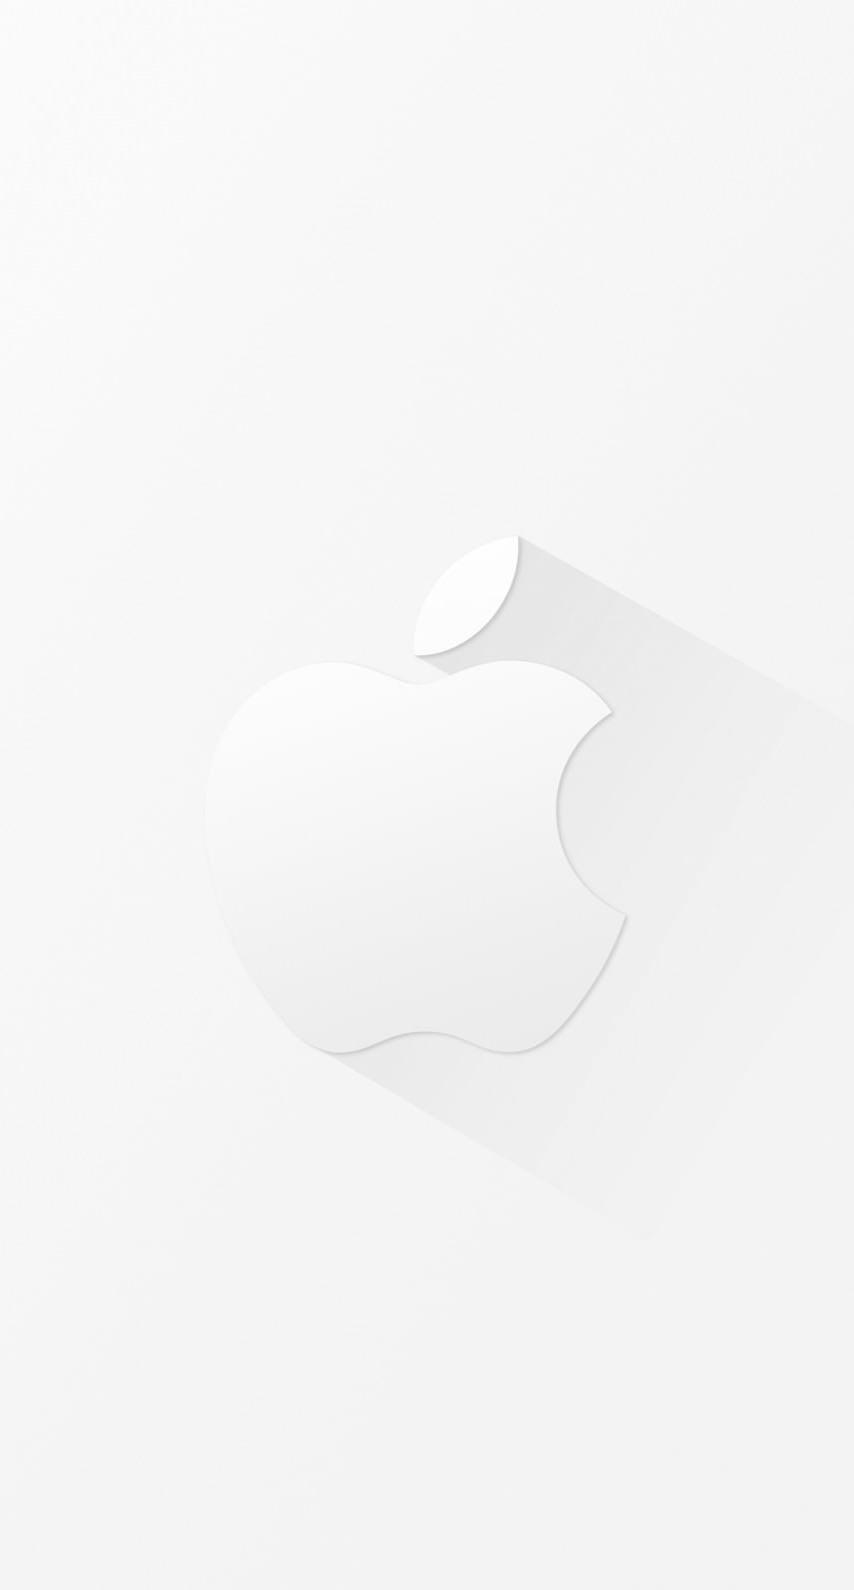 Cool White Apple Logo Wallpaper Sc Iphone7